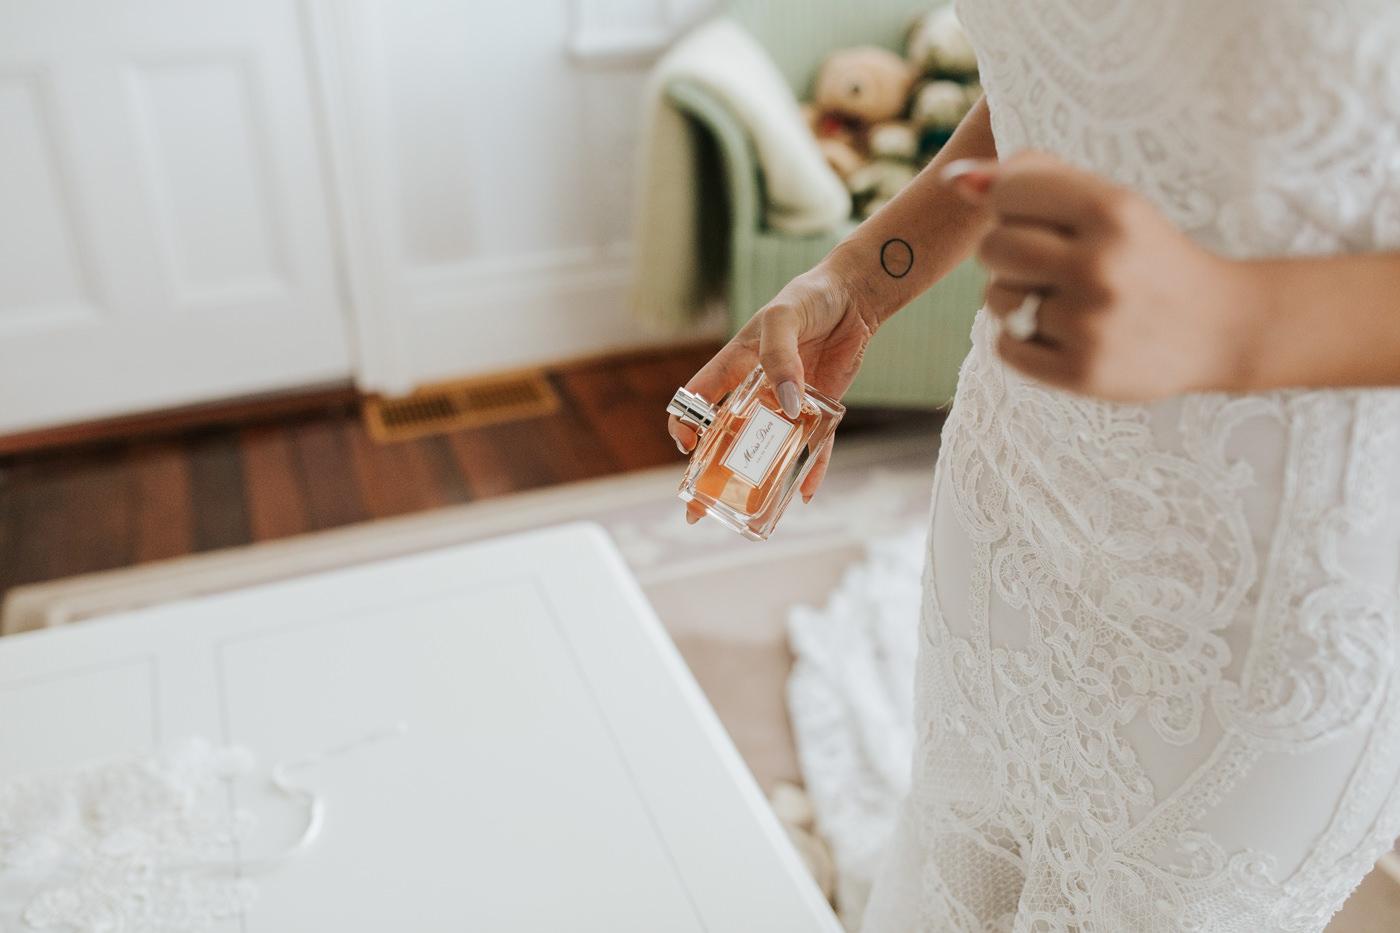 Nick & Vanezza - Fernbank Farm Wedding - Samantha Heather Photography-33.jpg